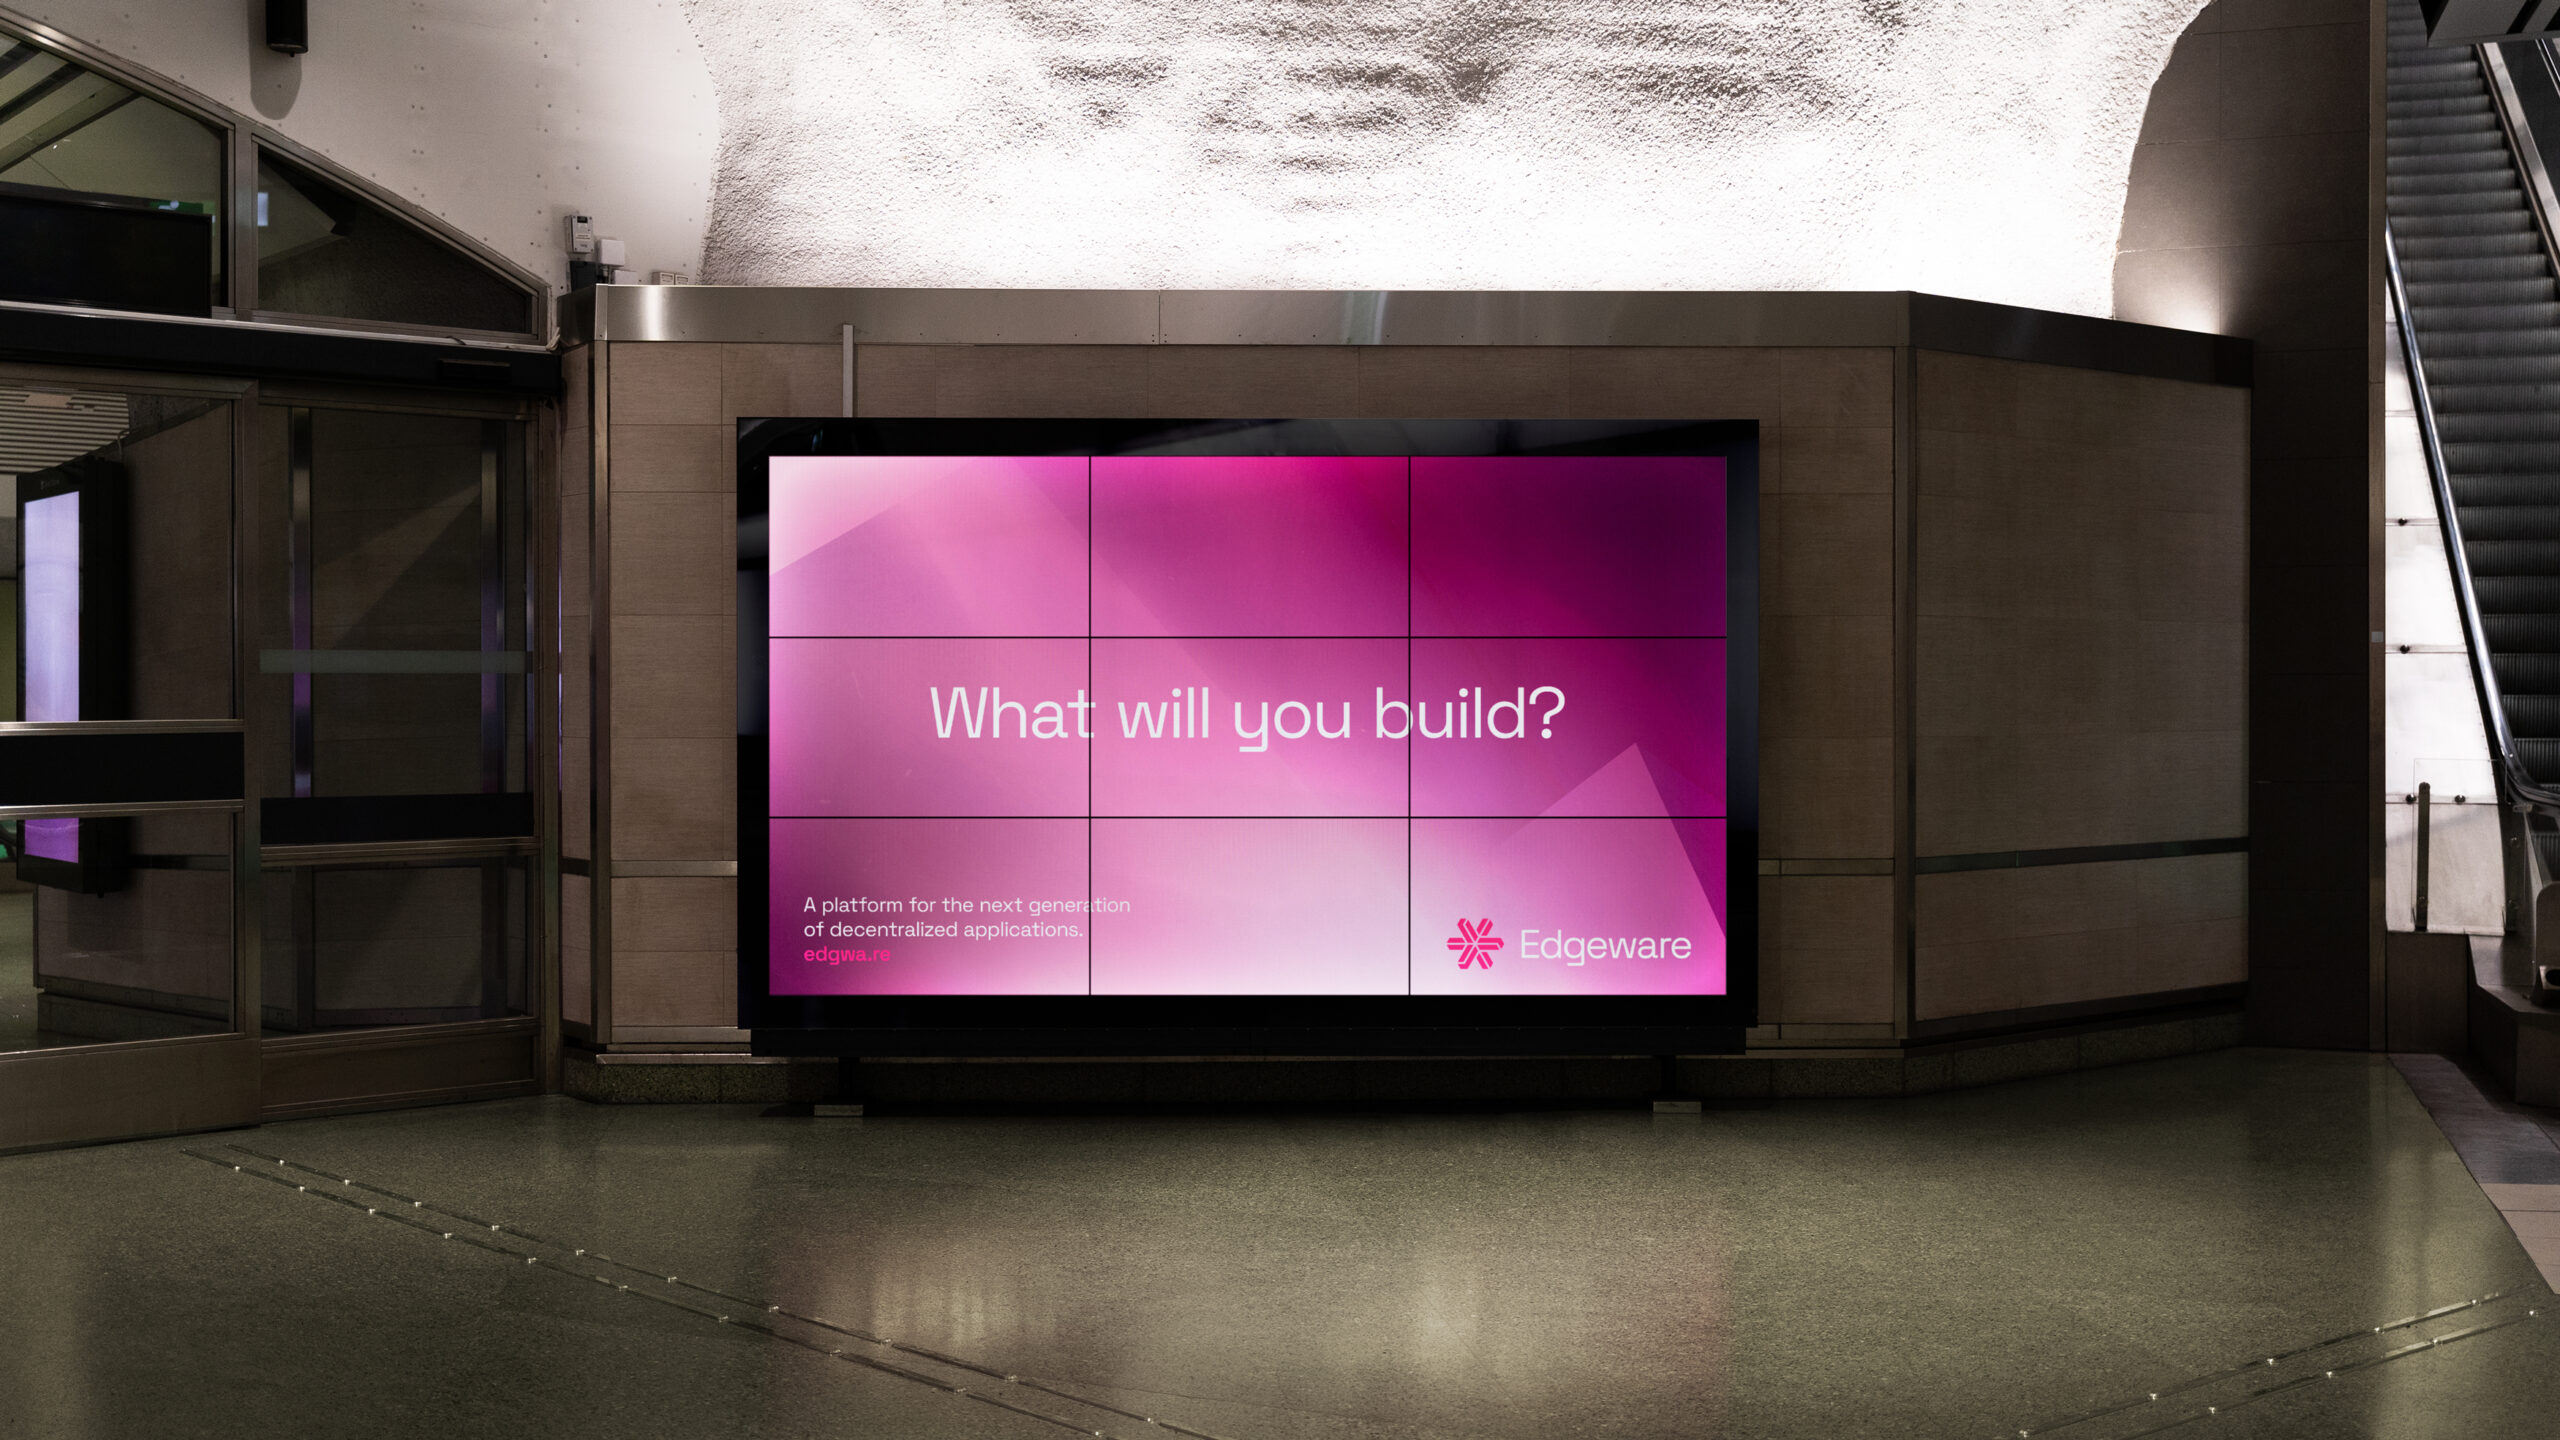 Edgeware out of home digital screen billboard in train station